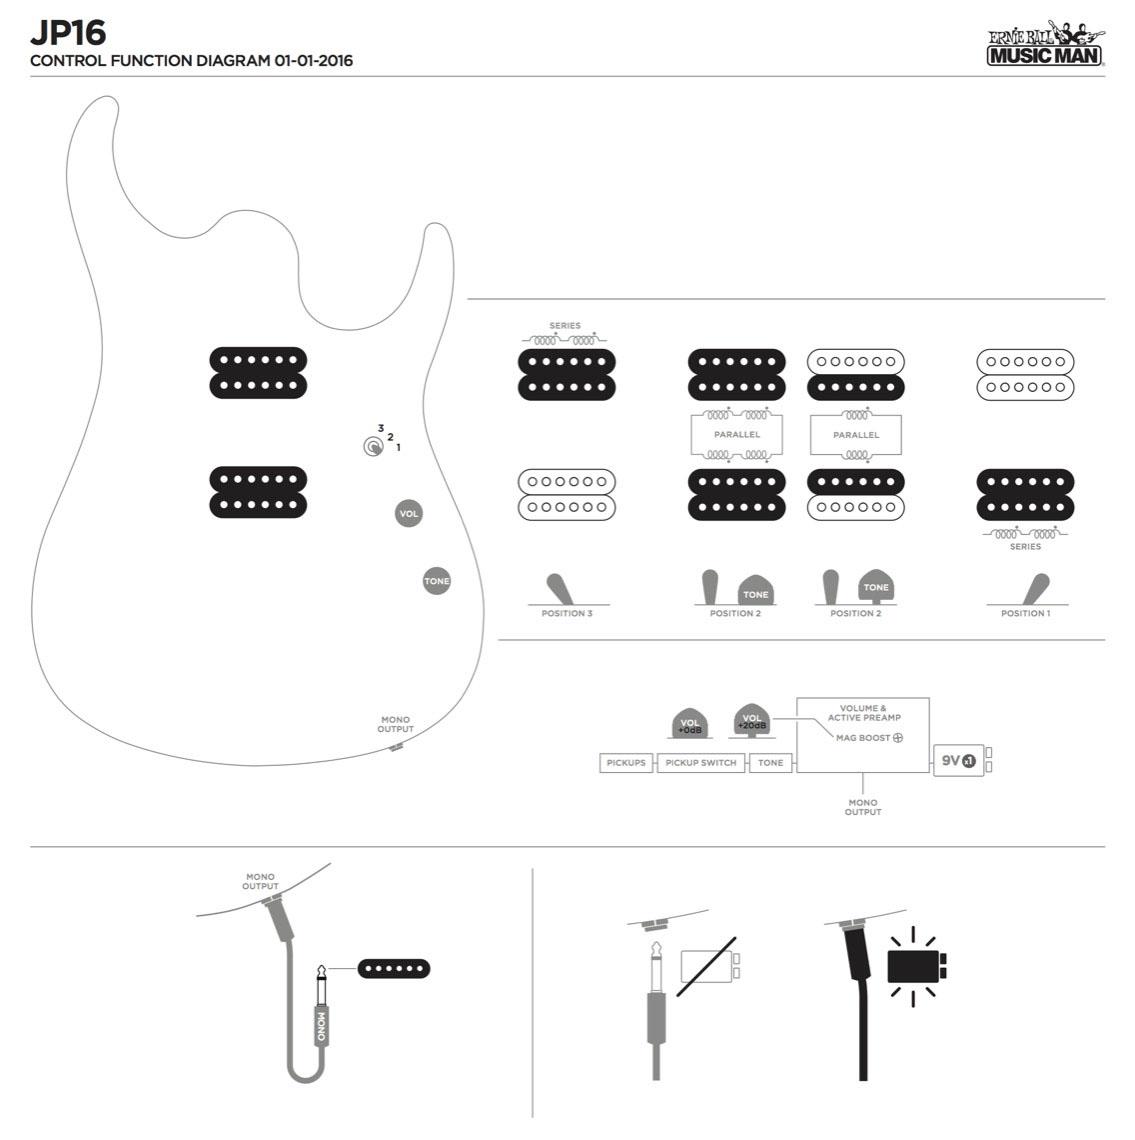 John Petrucci Ernie Ball Music Man Exhibits Jp16 Artist